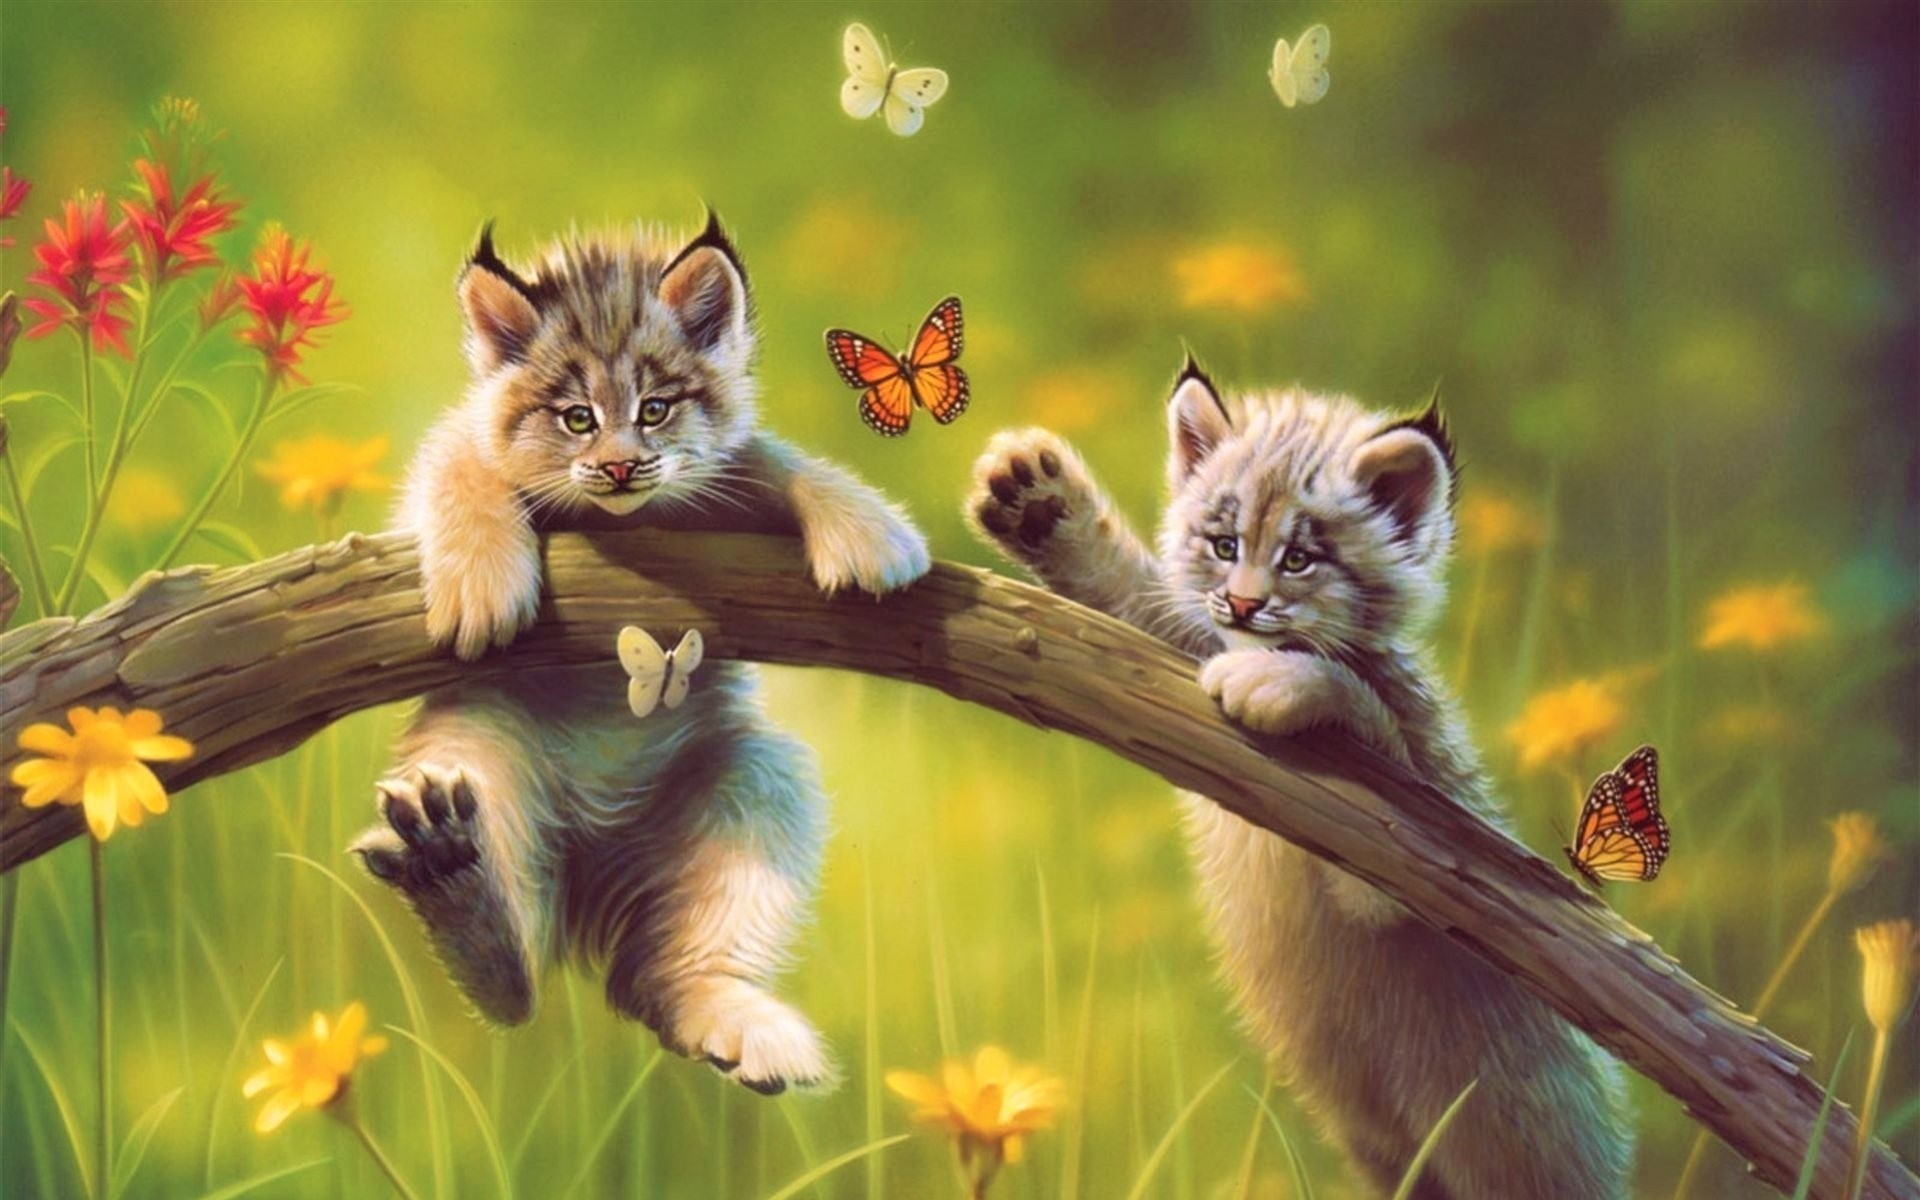 Artistic Baby Animal Butterfly Cat Cub Cute Lynx Meadow 1920x1200